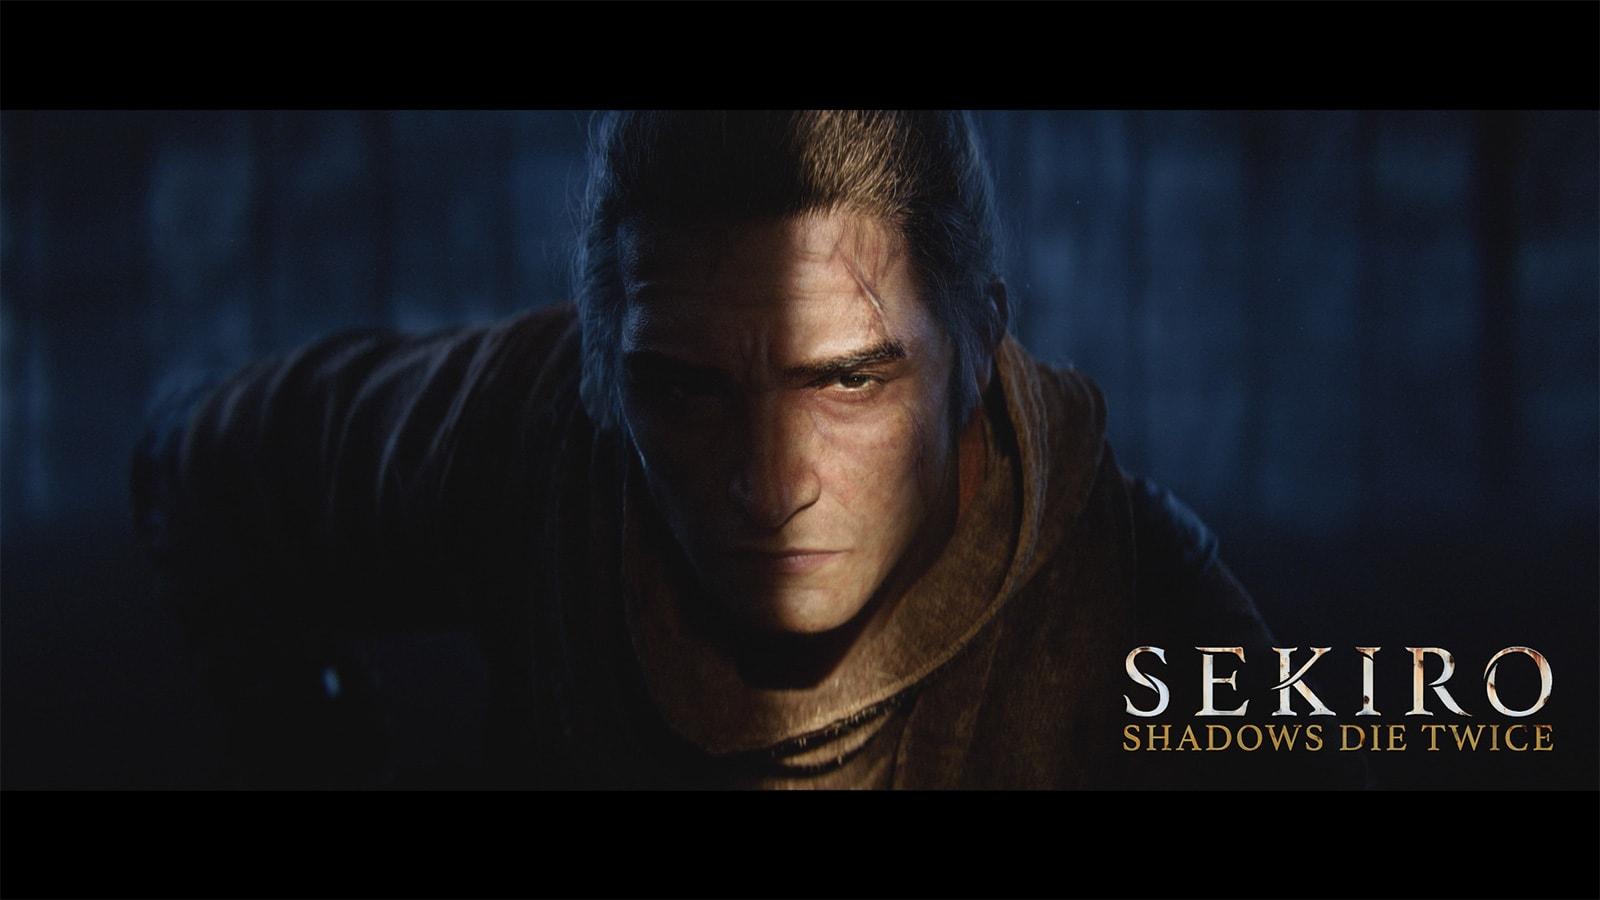 Sekiro: Shadows Die Twice trailer